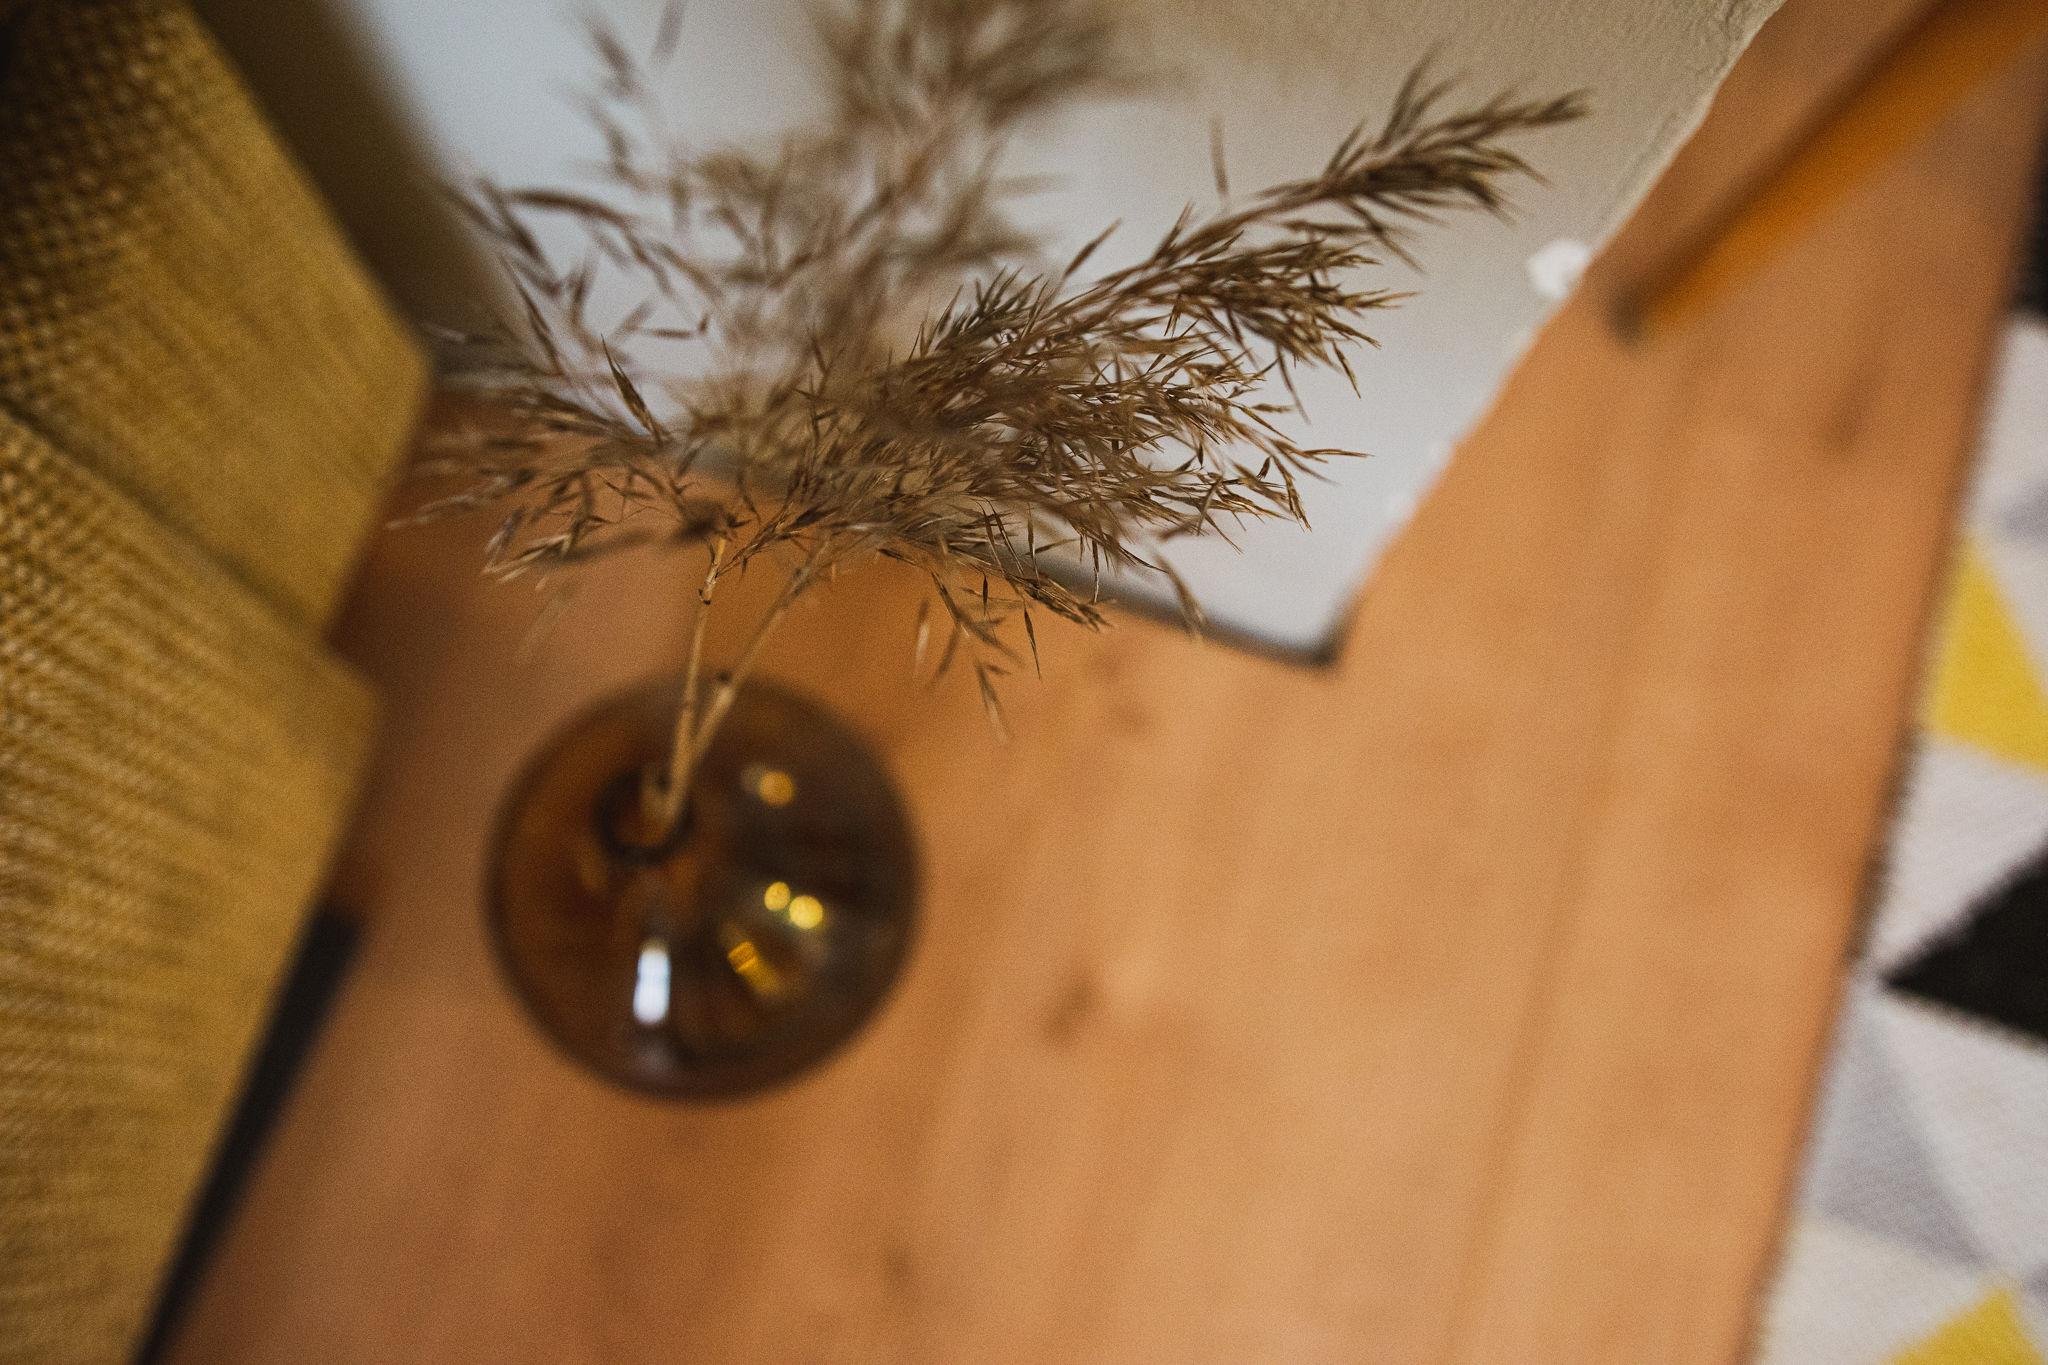 Nature inspired interior at Stiina's family home in Kerimäki, Saimaa